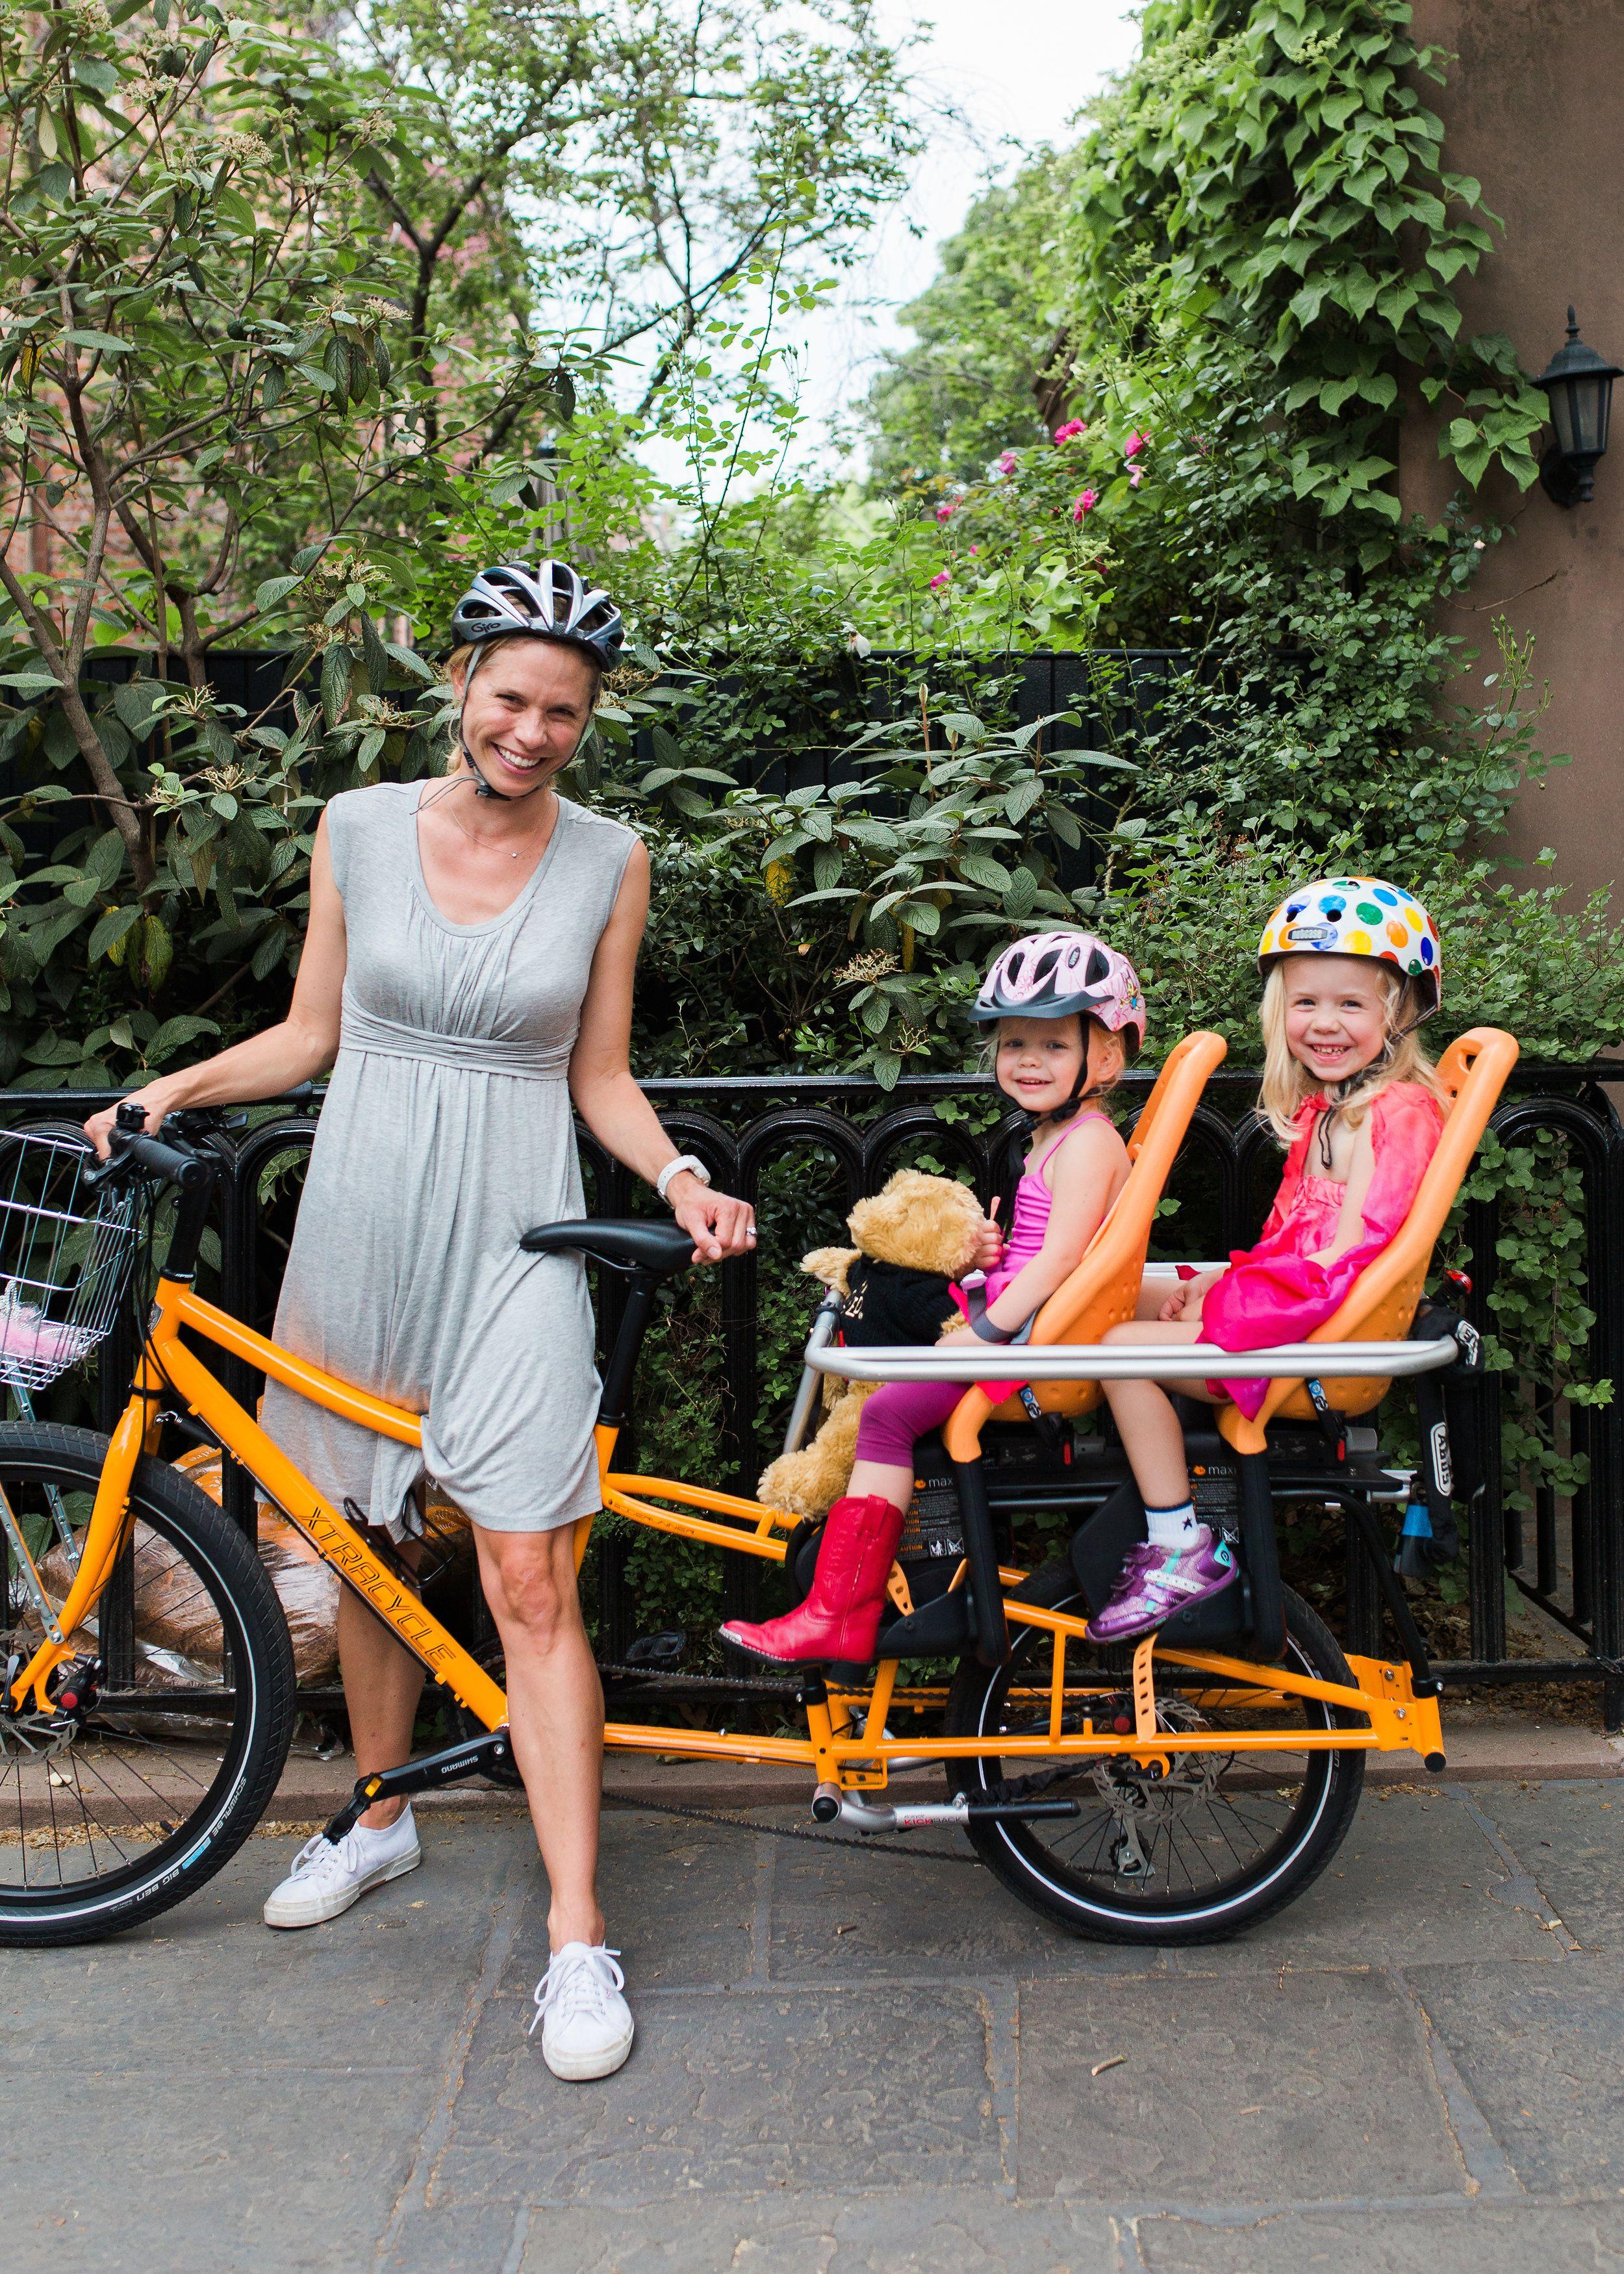 5 Awesome Family Bikes Bike Ride Family Bike Bike Trailer